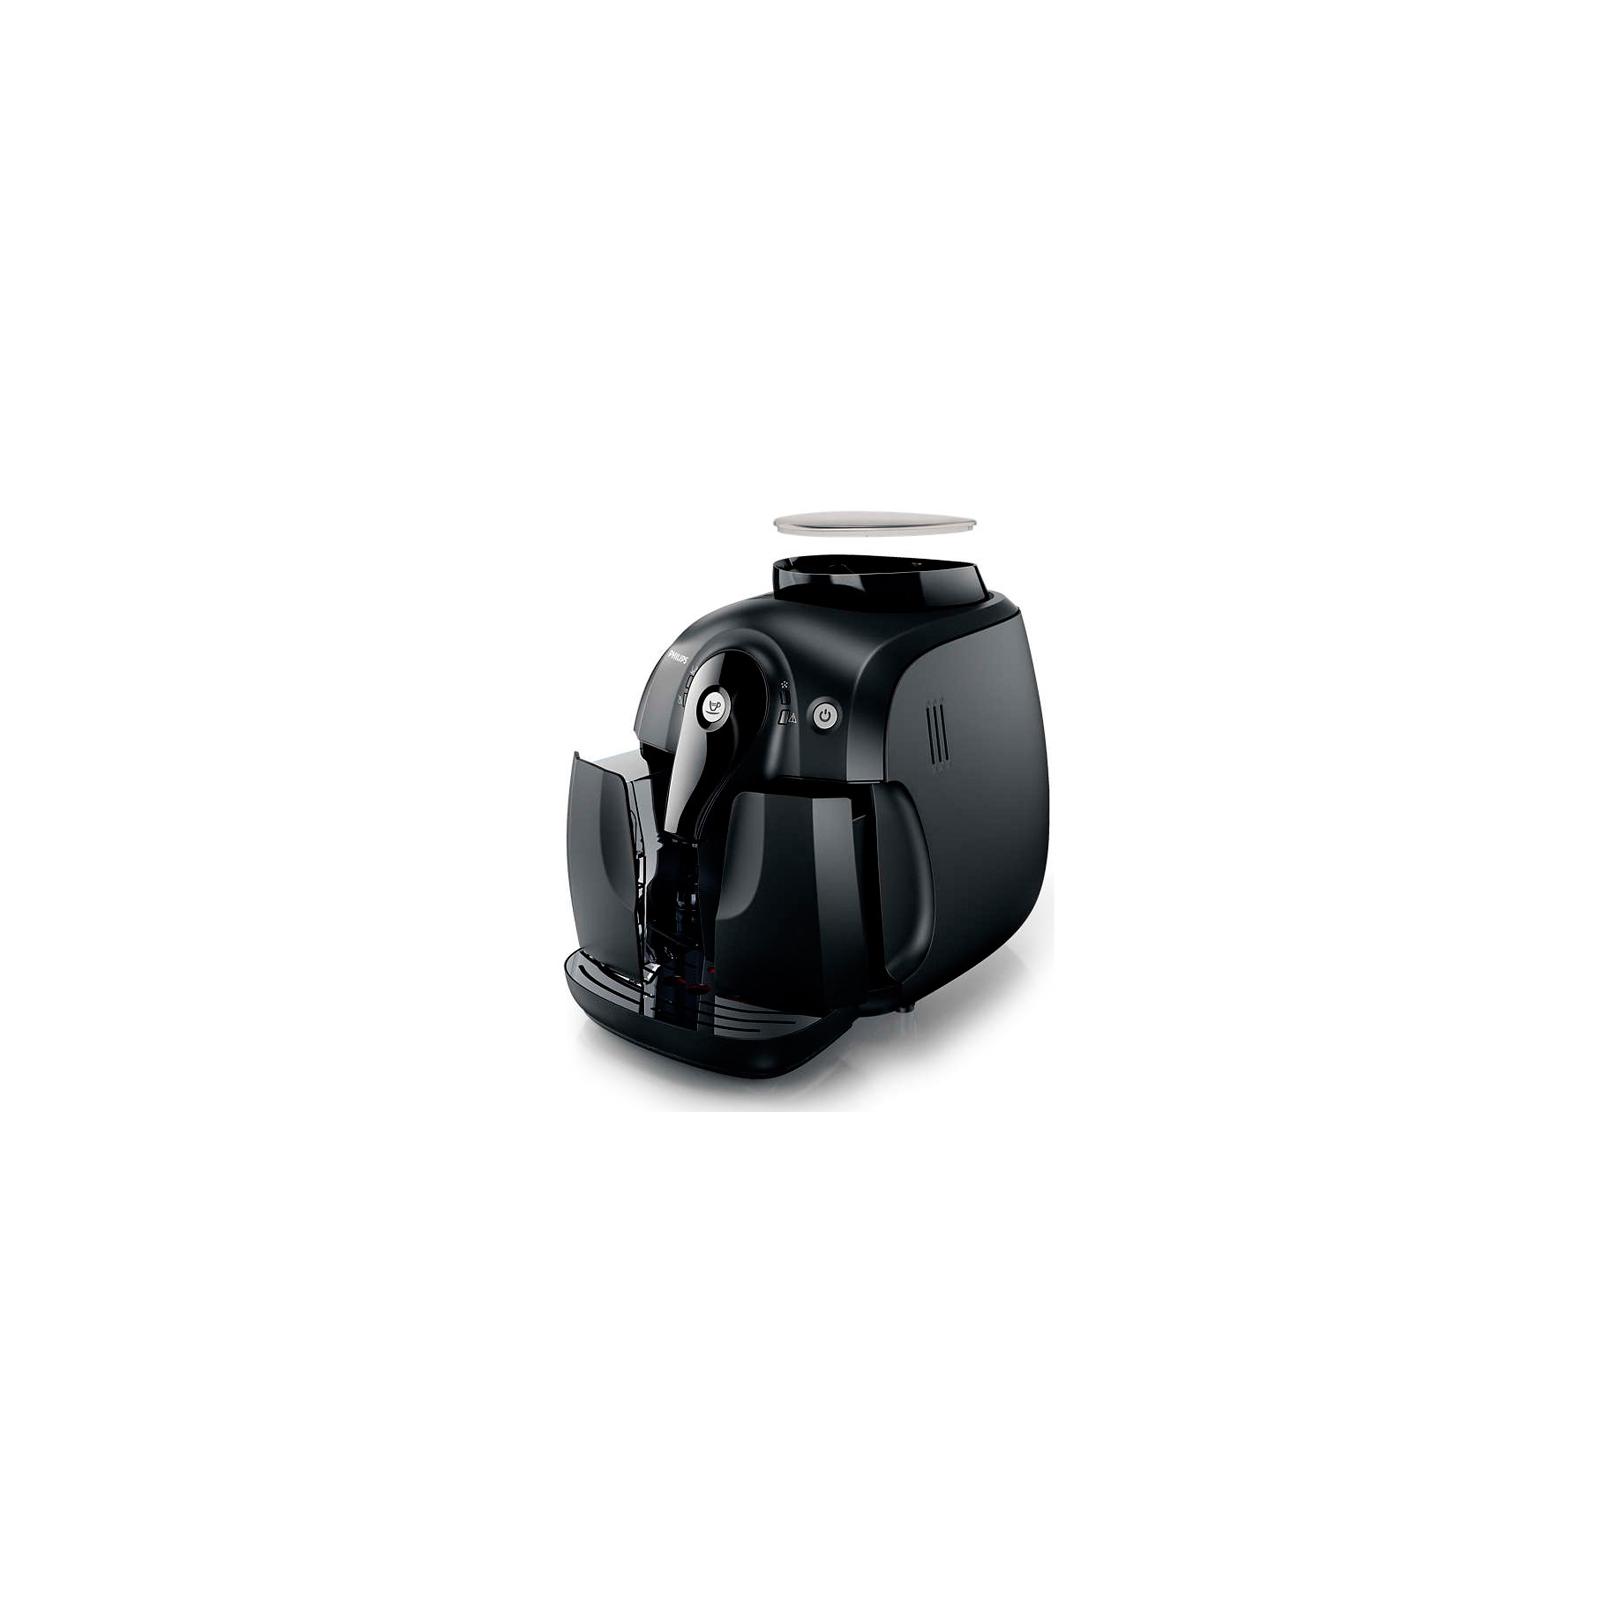 Кофеварка PHILIPS 2000 Puro (HD8648/01) изображение 4